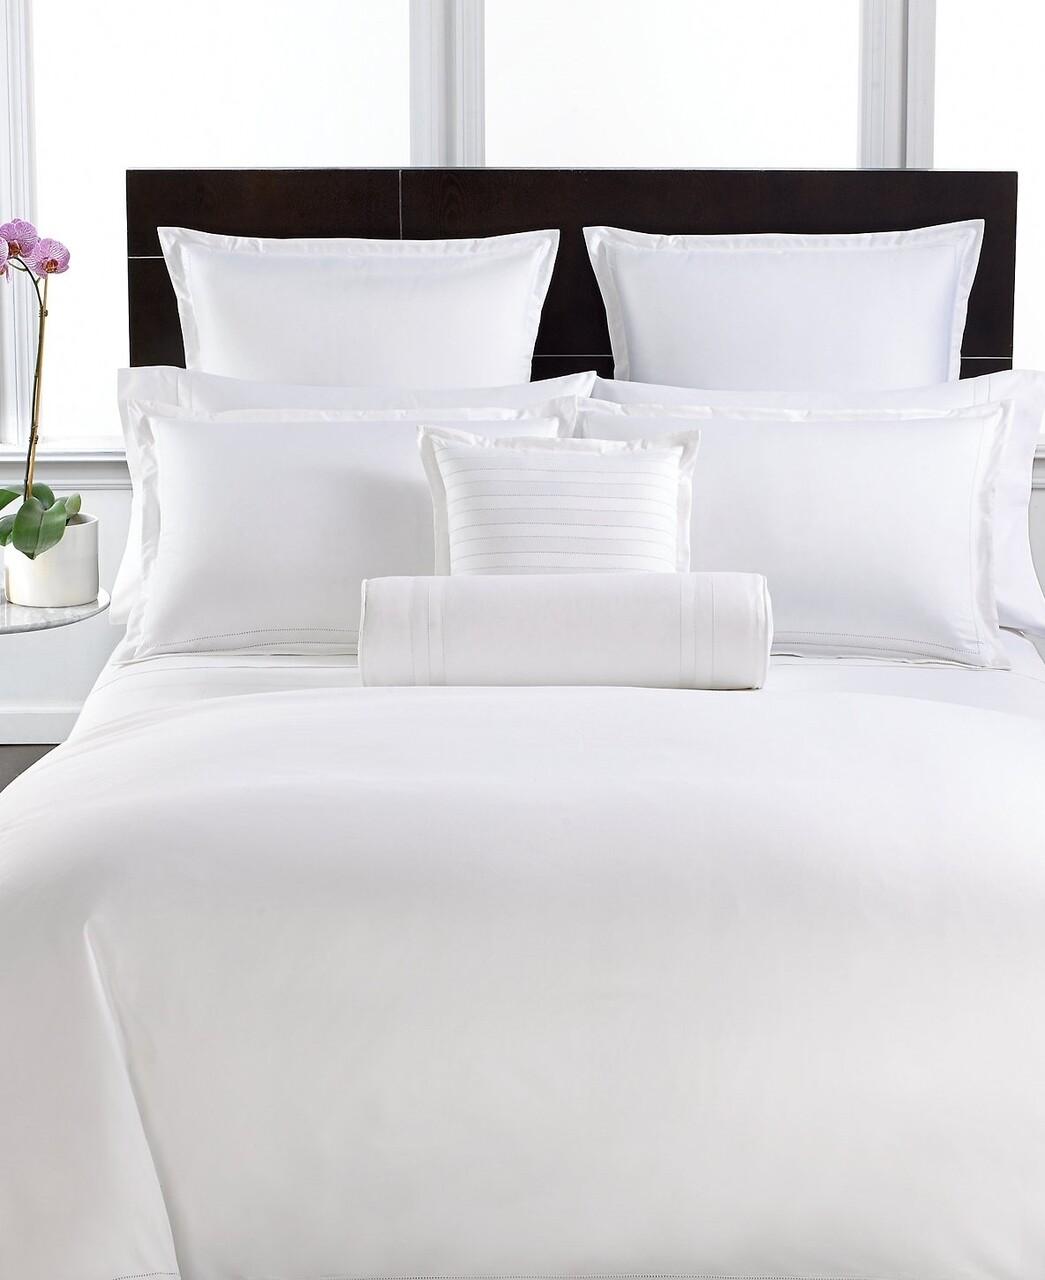 Lenjerie de pat pentru o persoana, Boutique Satin, Luxury, 3 piese, 100% bumbac egiptean satinat, TC 400, 160 gr/mp, alb